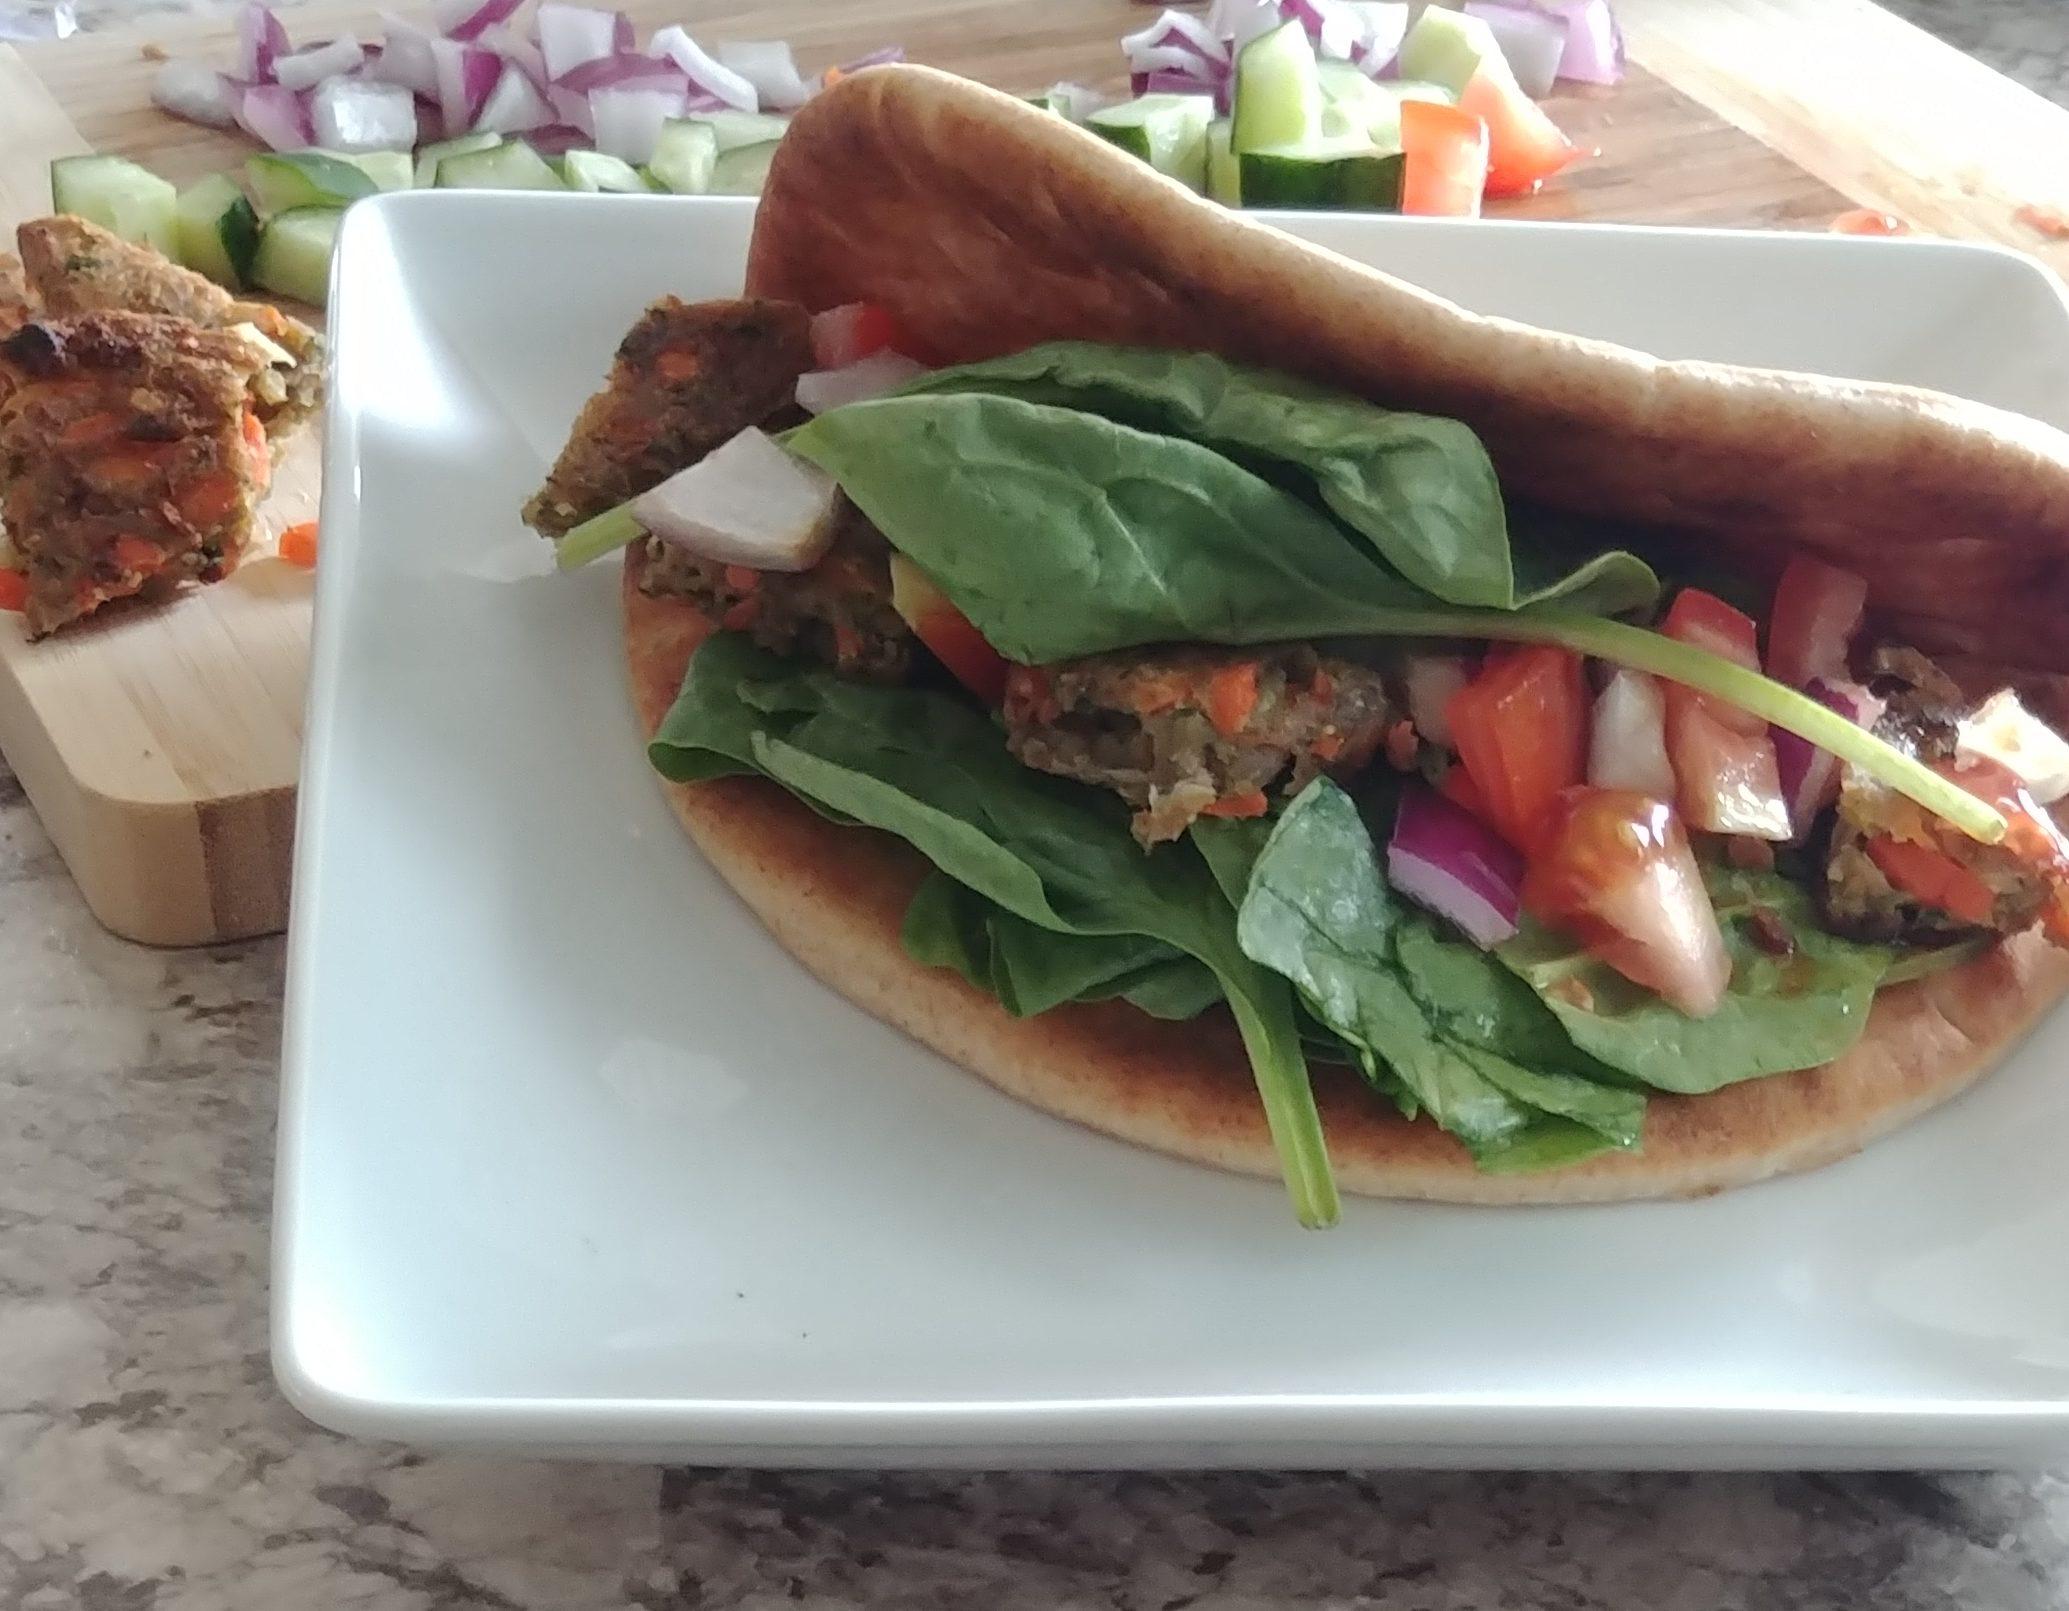 Veggie Burger Pita Wrap with cut veggies in background